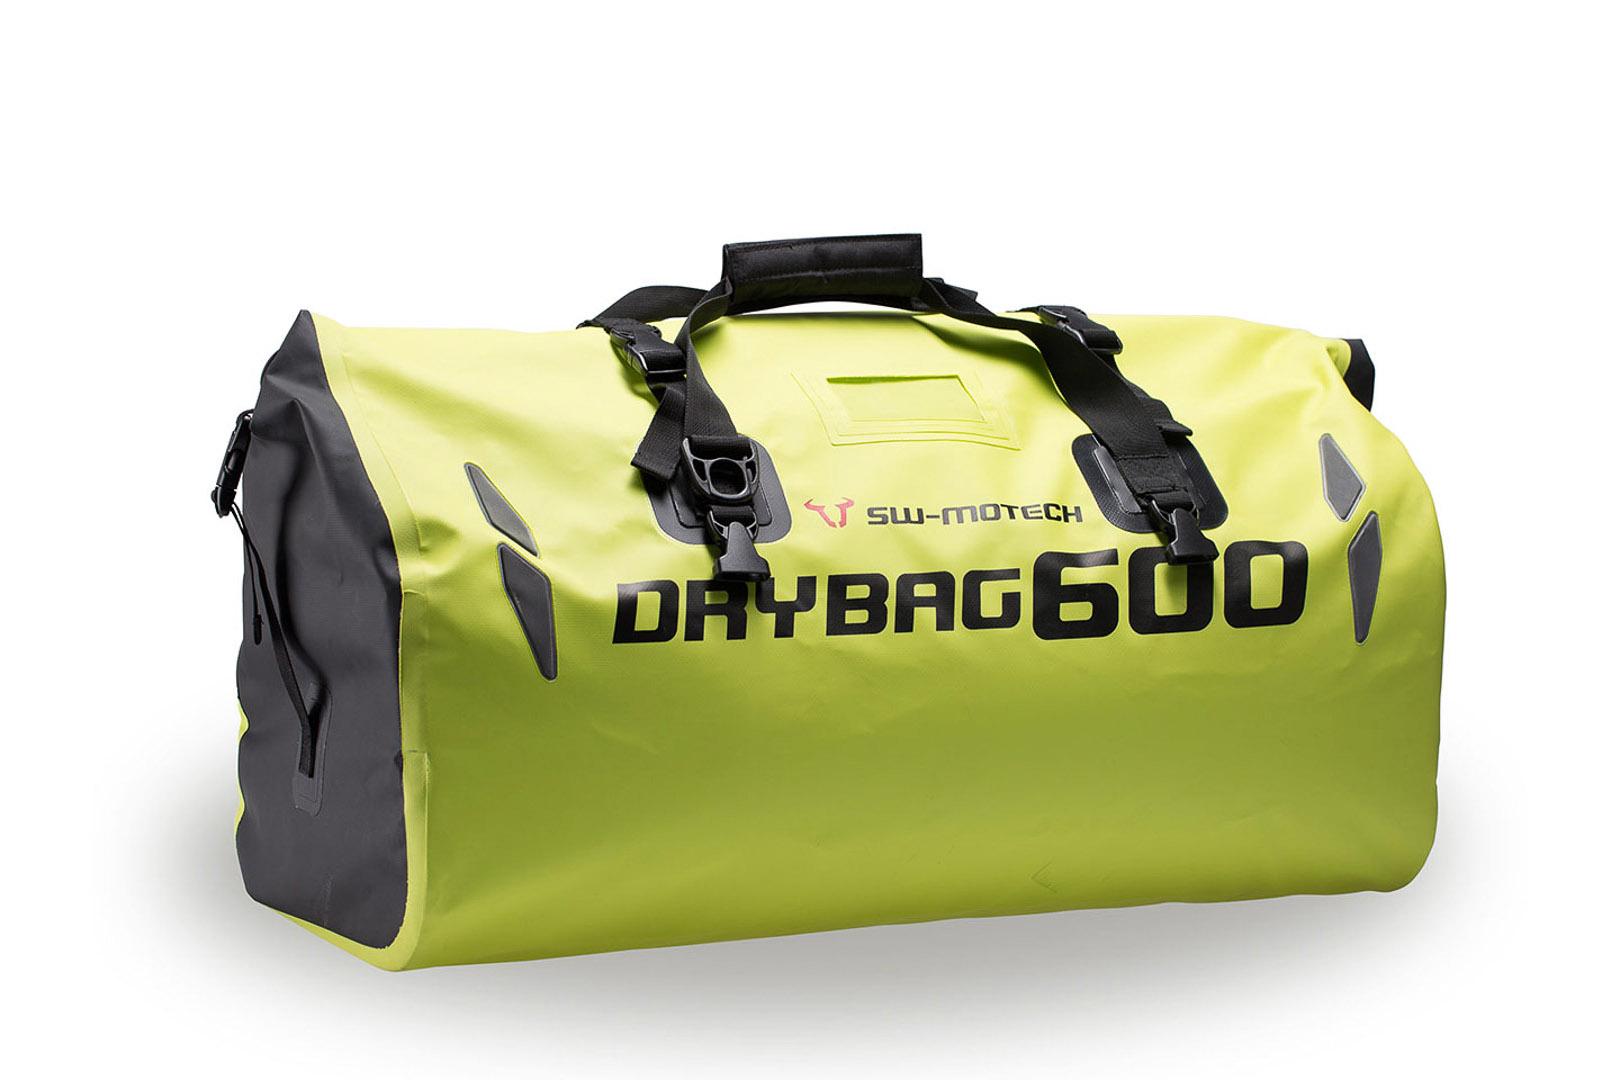 Tailbag Drybag 600